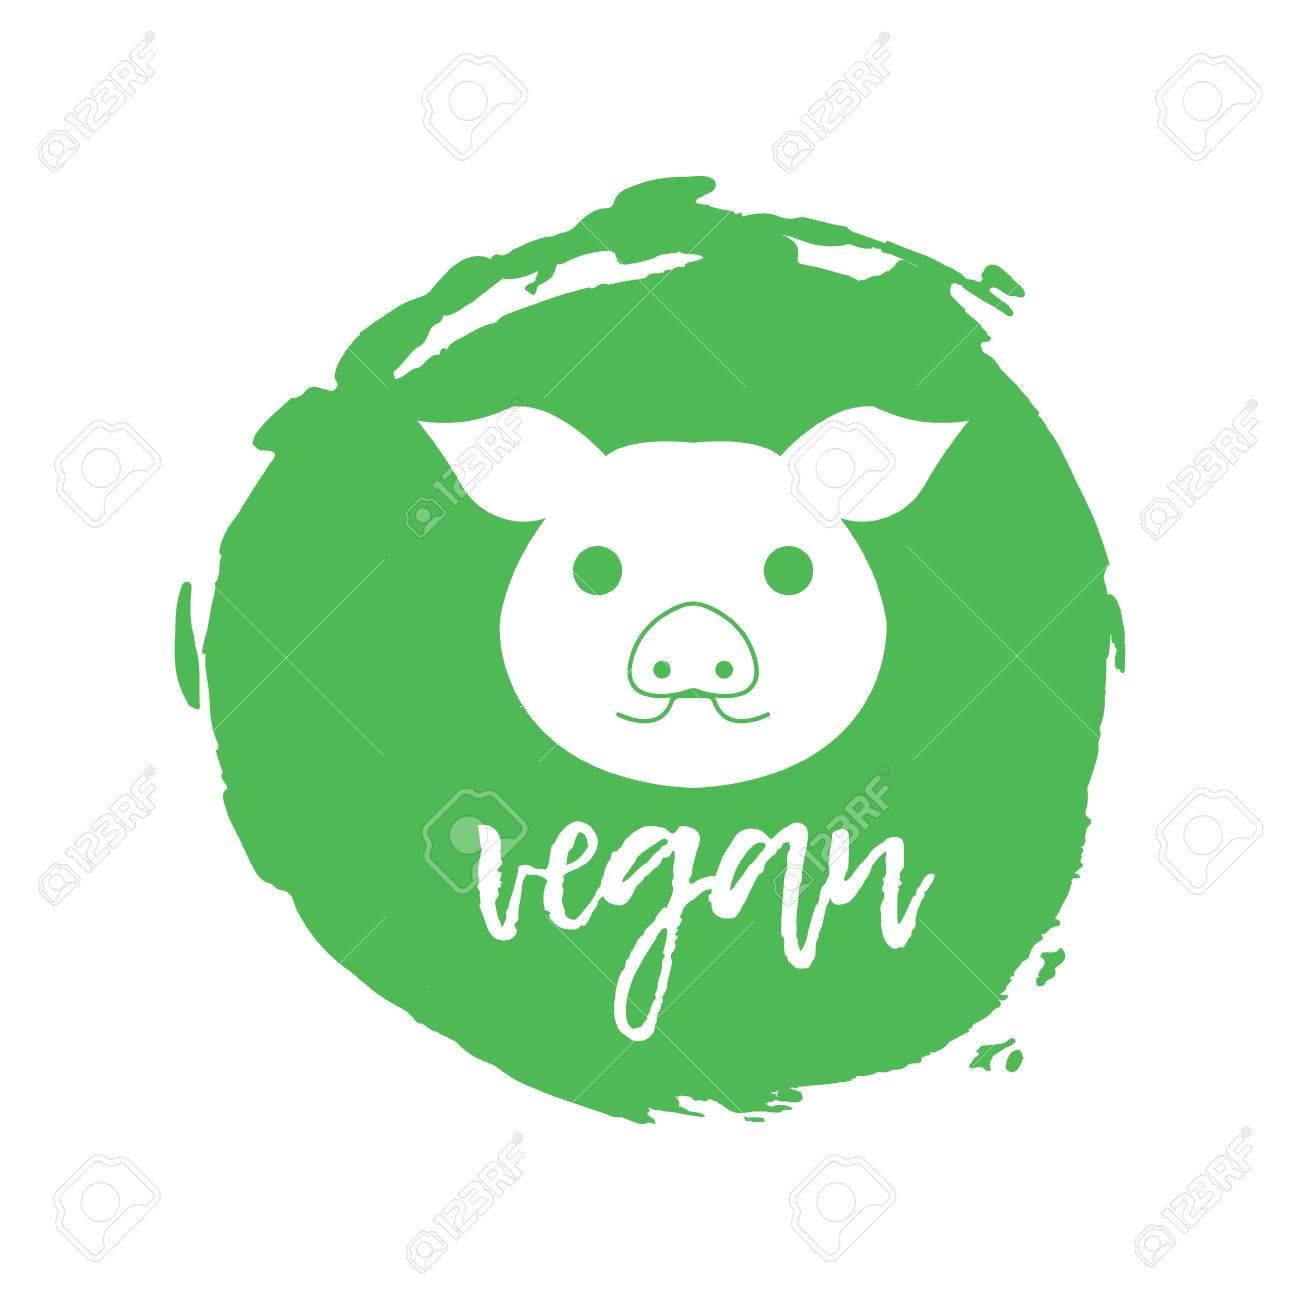 Vegan free label food intolerance symbols vector illustration vegan free label food intolerance symbols vector illustration stock vector 78445063 biocorpaavc Images